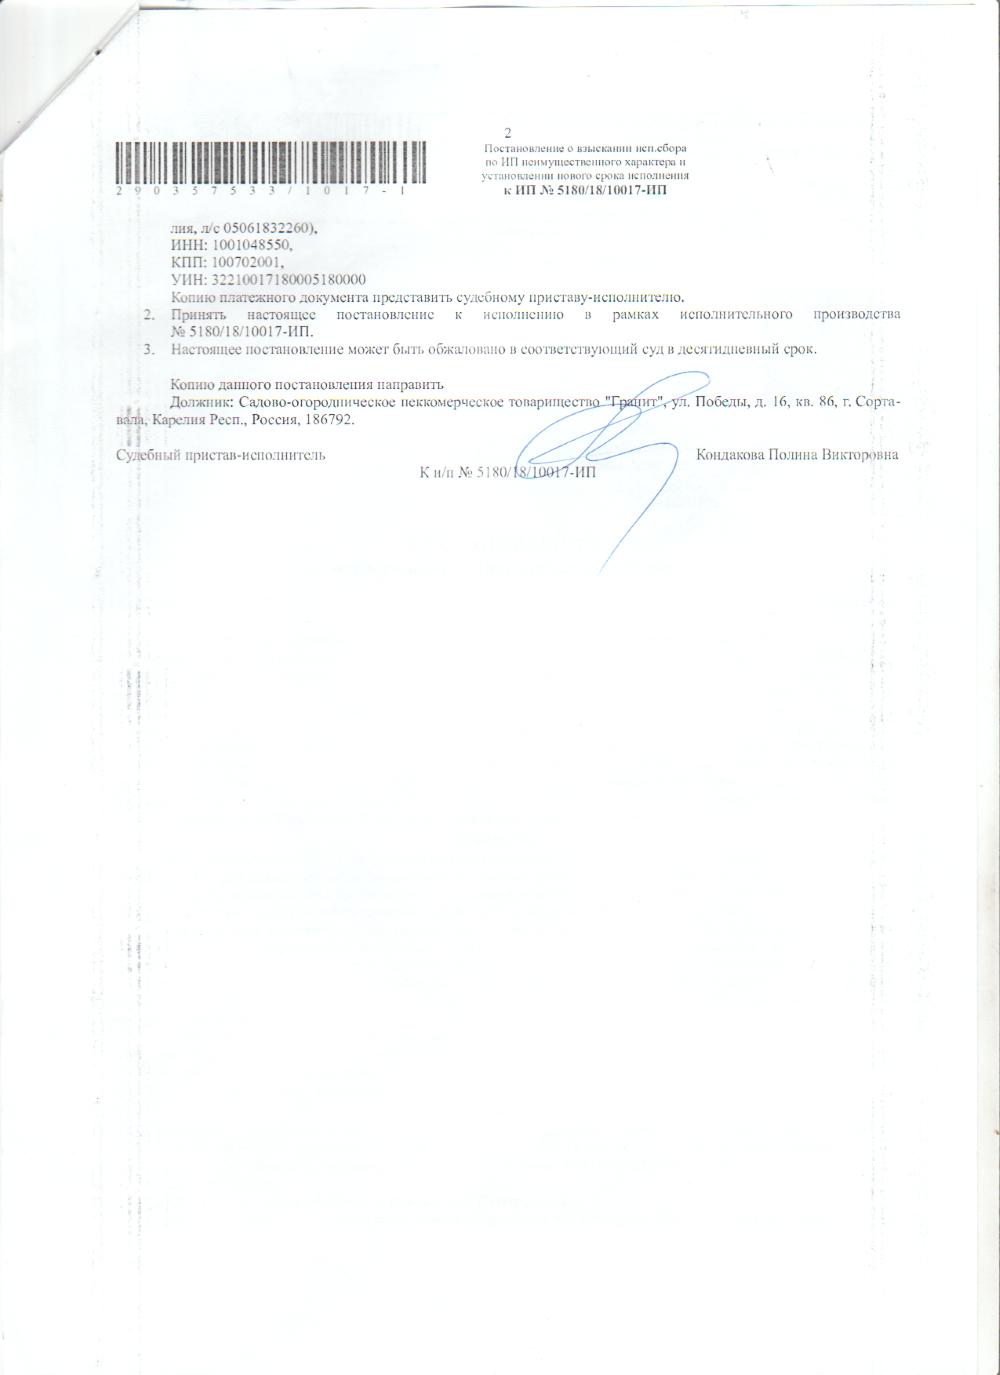 https://sontgranit.ru/forum/img/sokol/исп-сбор-50-4.png